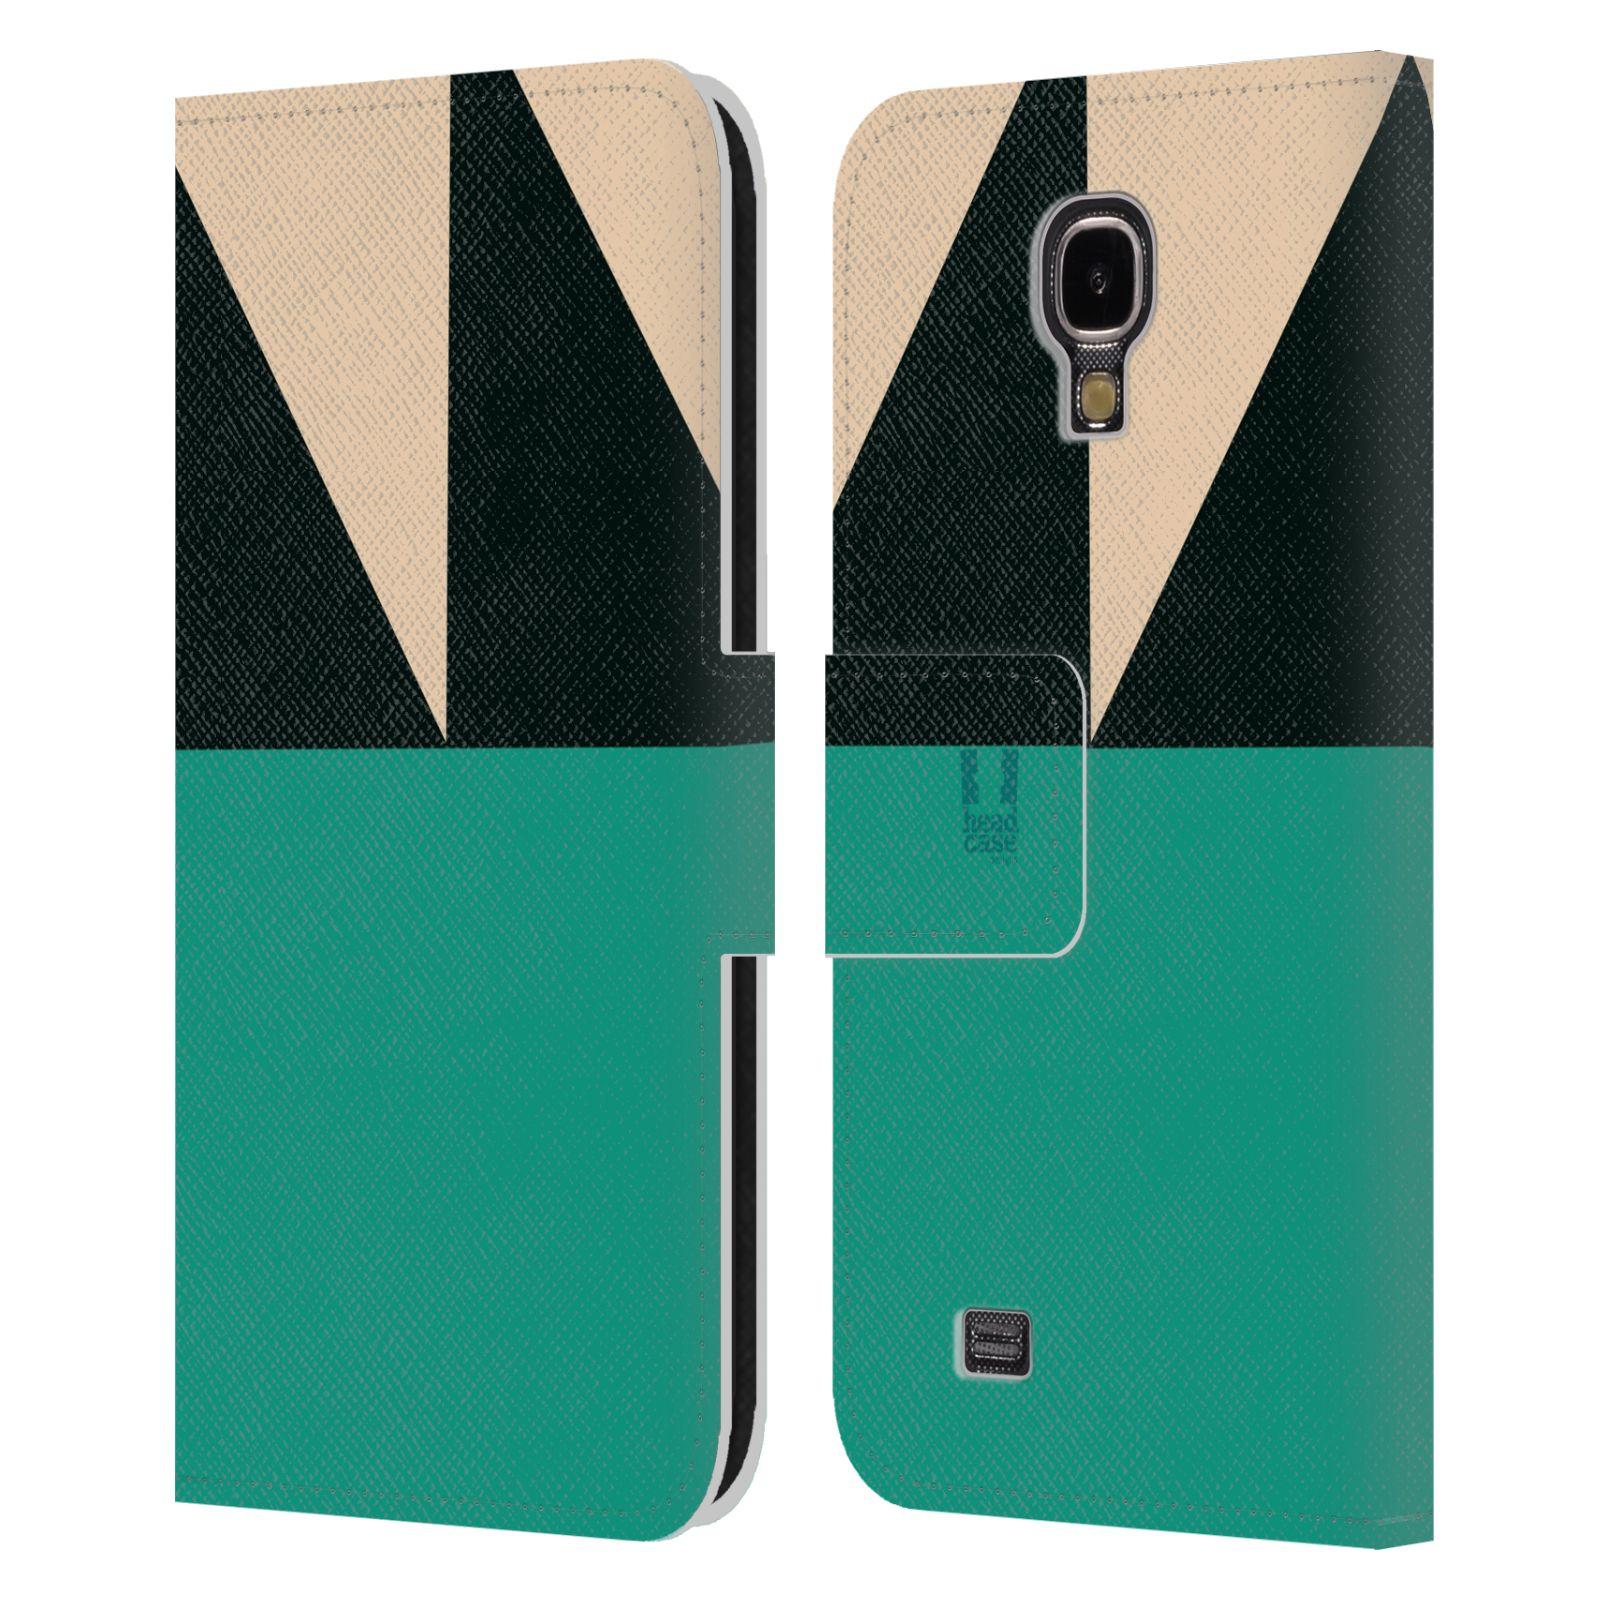 HEAD CASE Flipové pouzdro pro mobil Samsung Galaxy S4 I9500 barevné tvary moře modrá